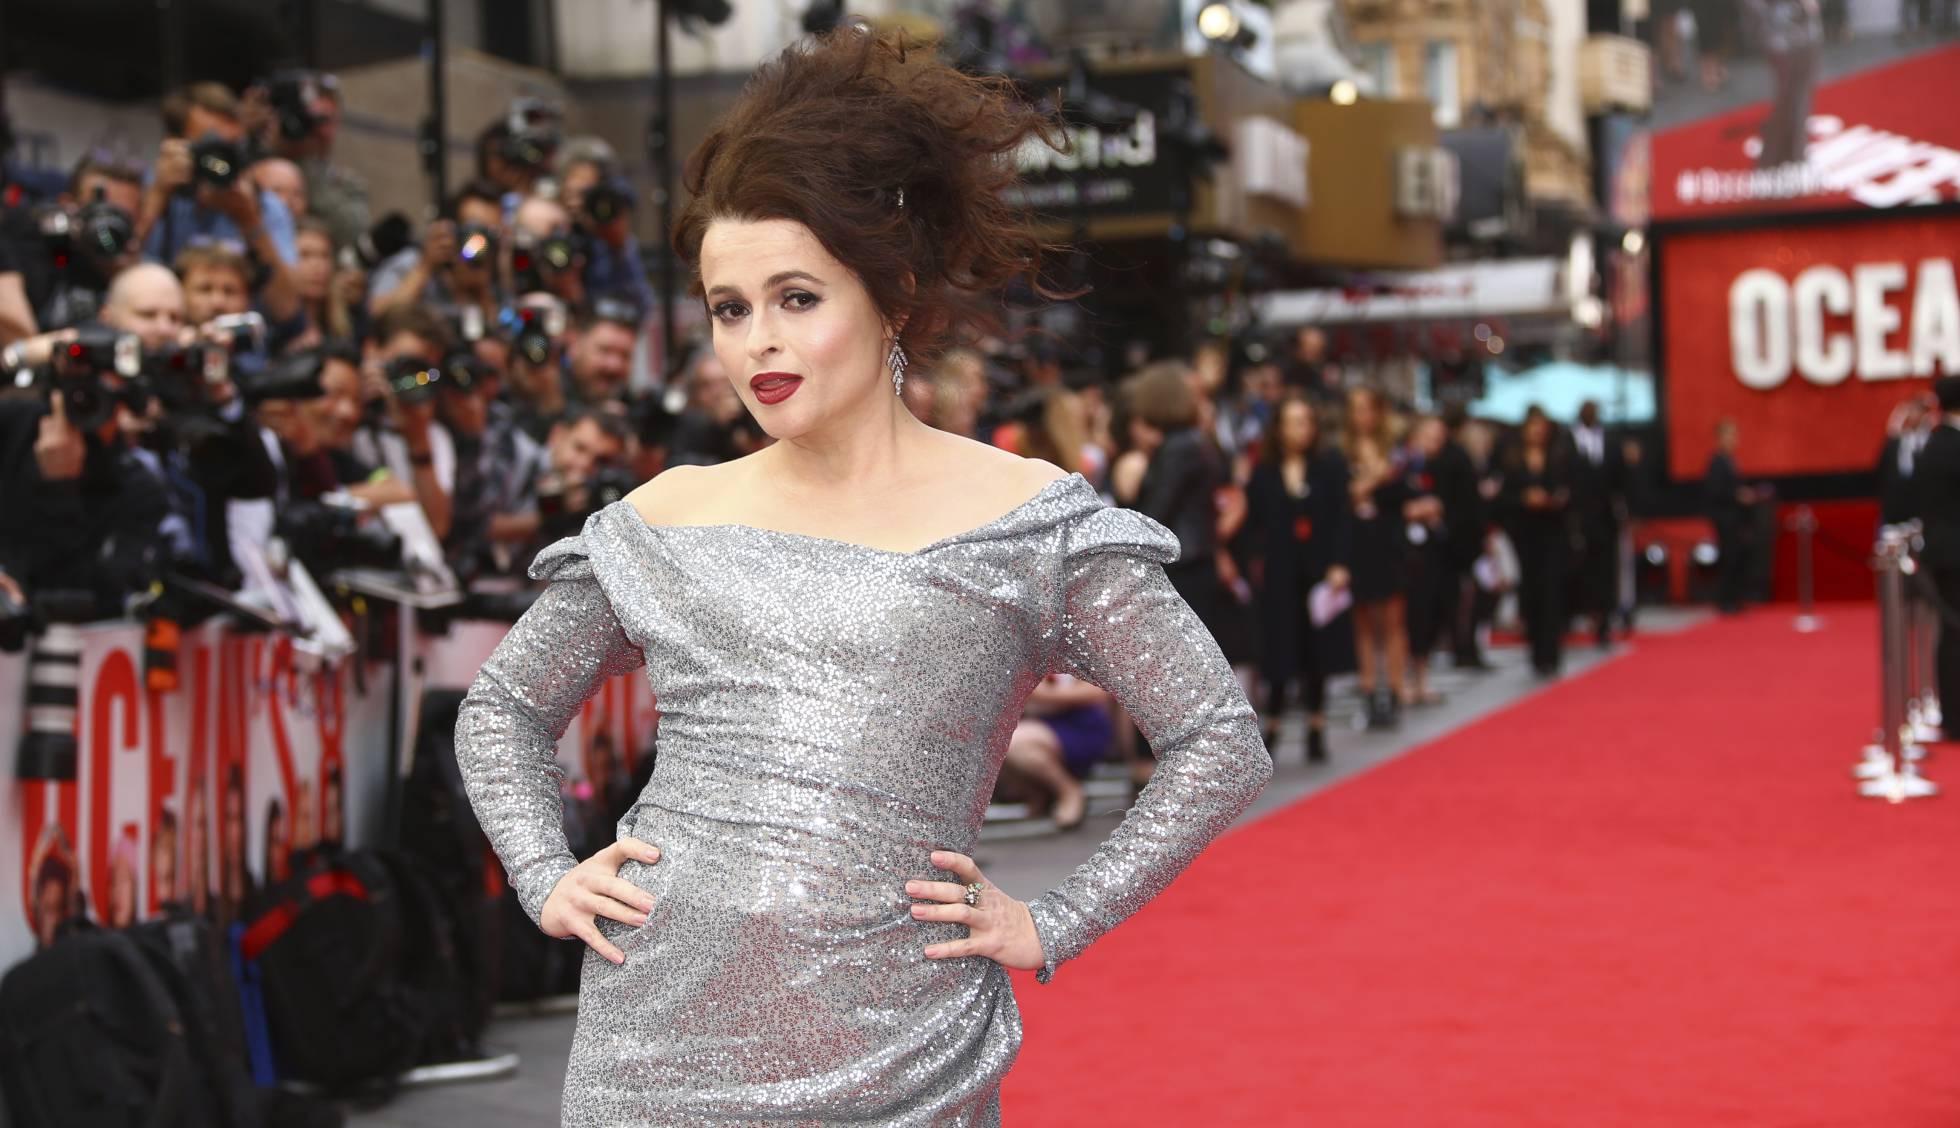 Helena Bonham Carter recurre a un médium para contactar con la princesa Margarita de Inglaterra